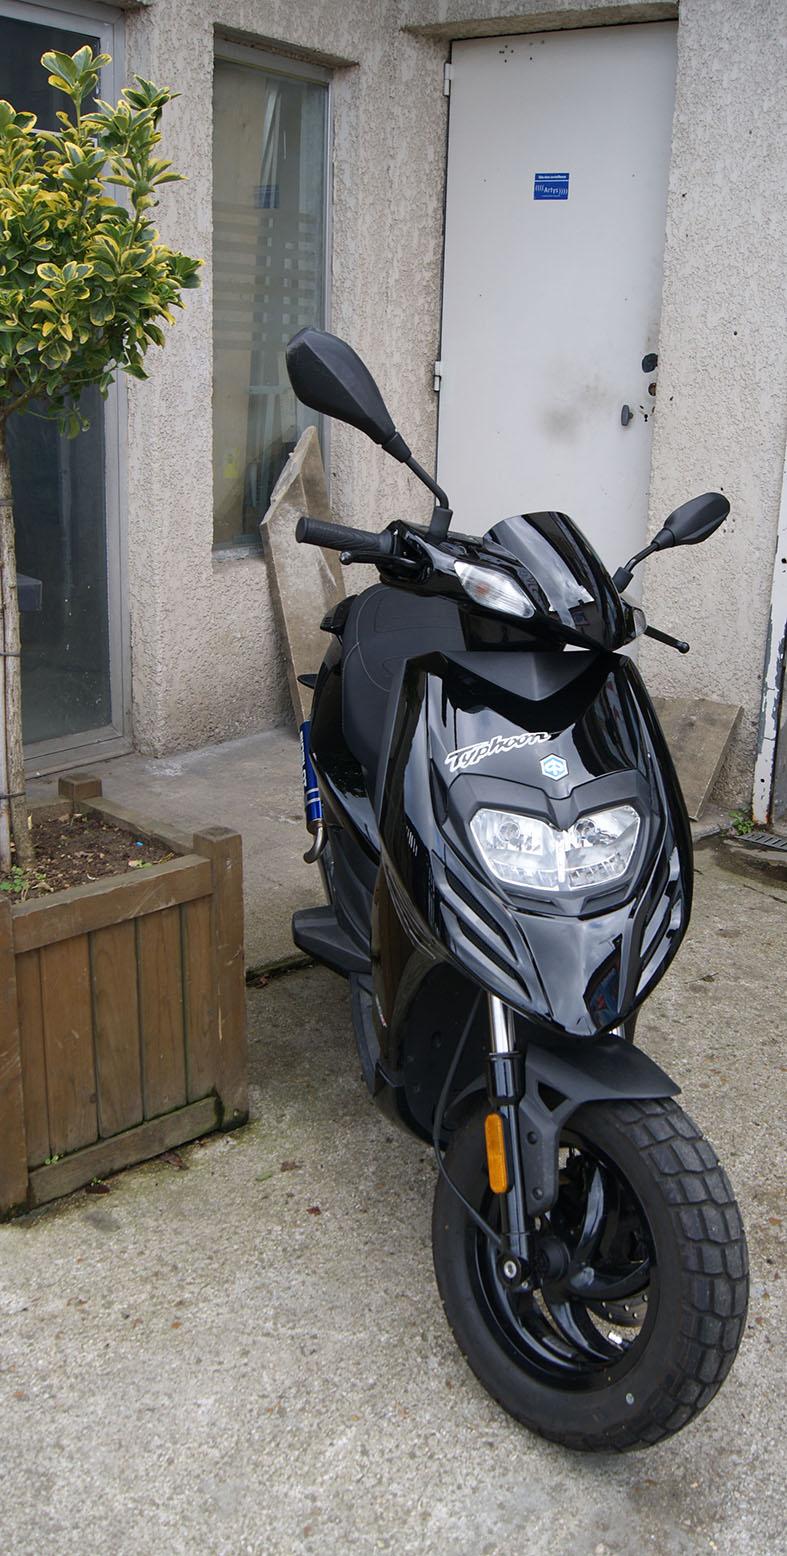 scooter et moto 50 cm piaggio typhoon 50. Black Bedroom Furniture Sets. Home Design Ideas